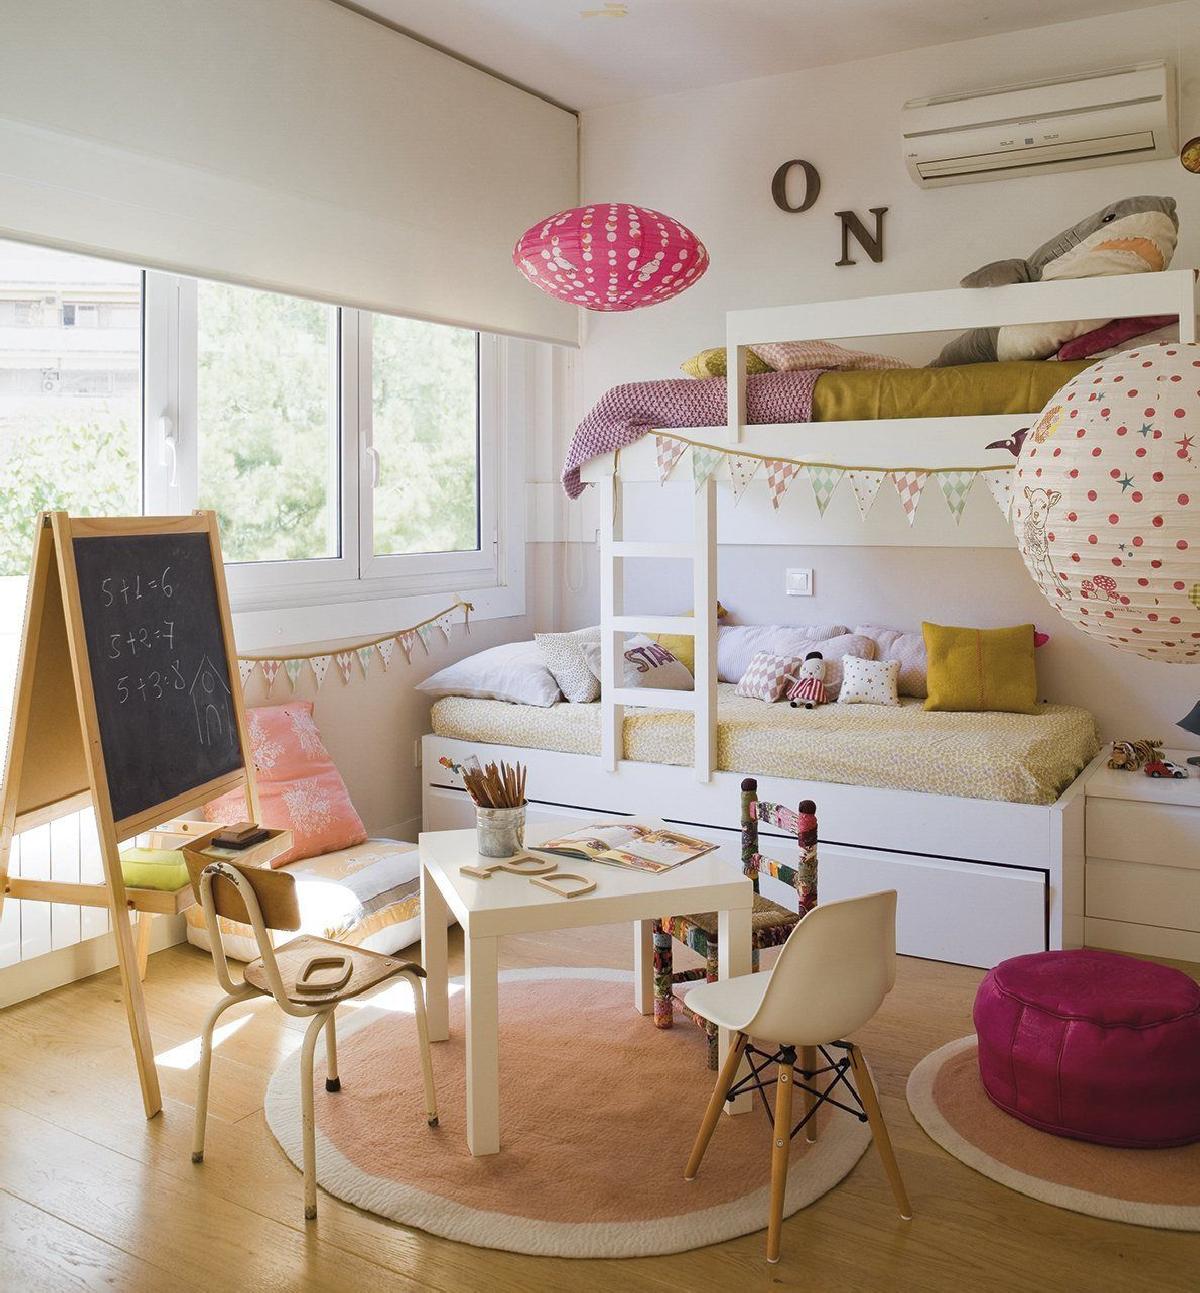 Paylasilan cocuk yatak odalari nasil dekore edilir